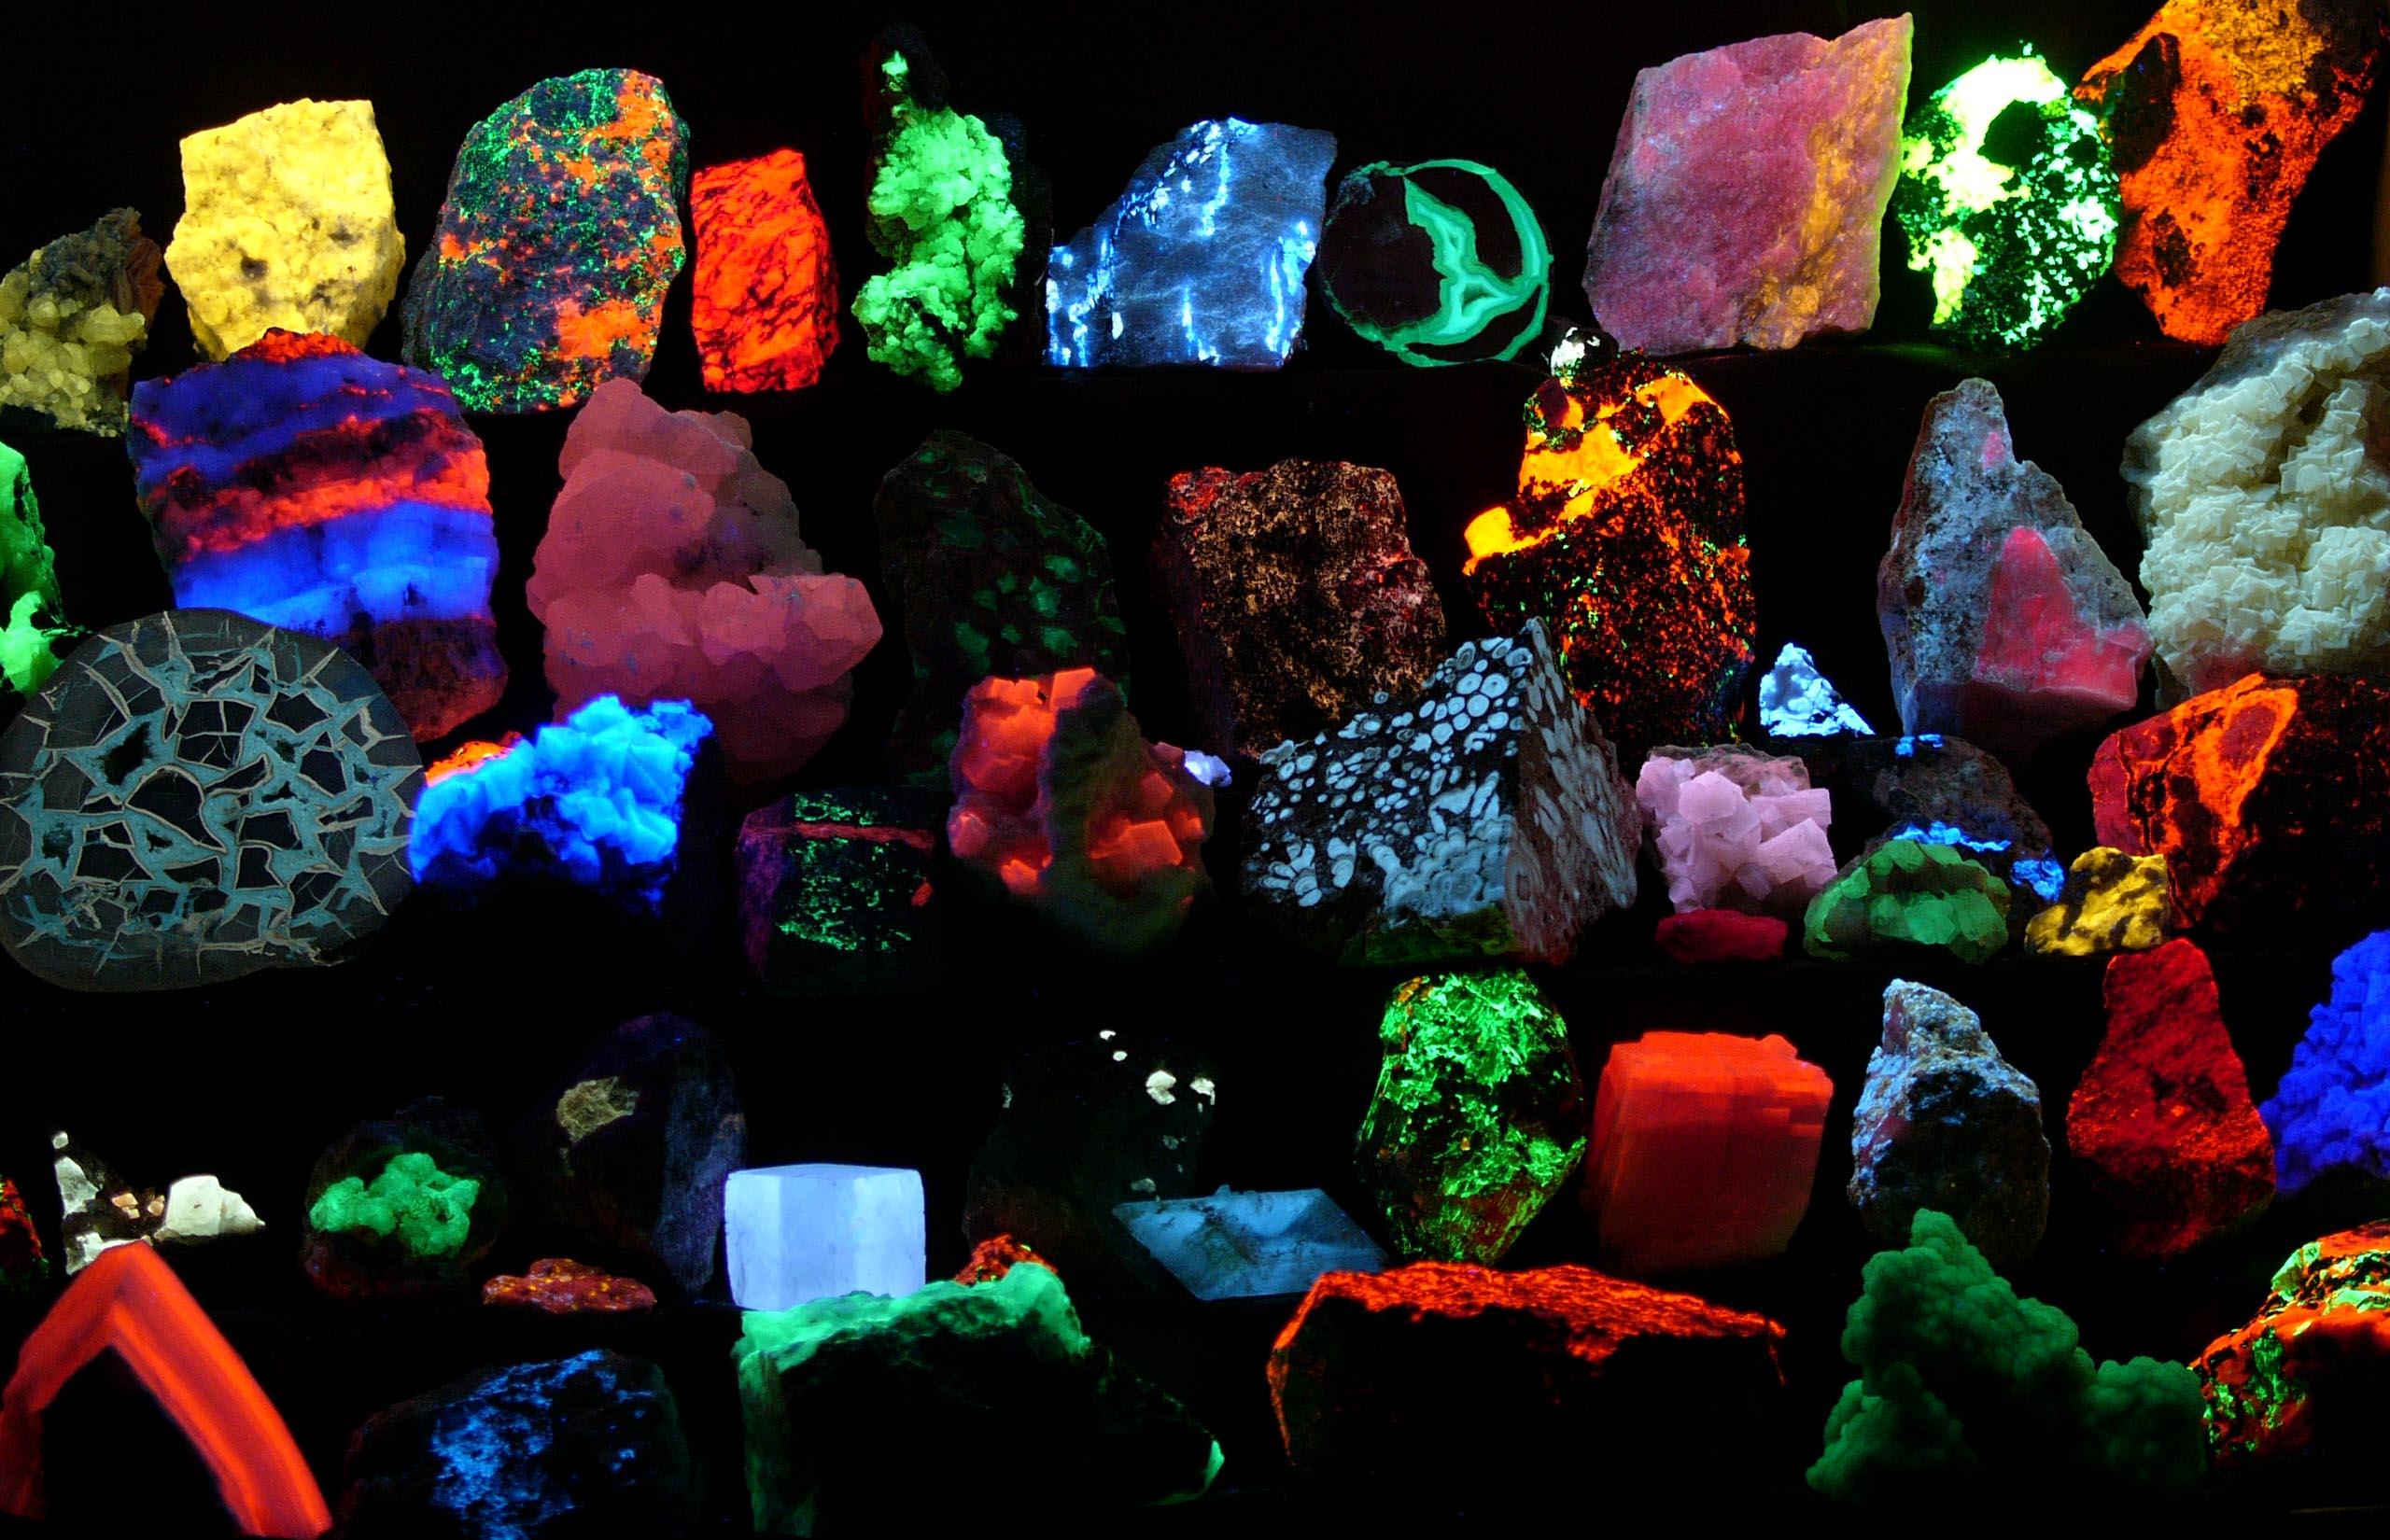 Fluorescent_minerals_hg.jpg?width=500